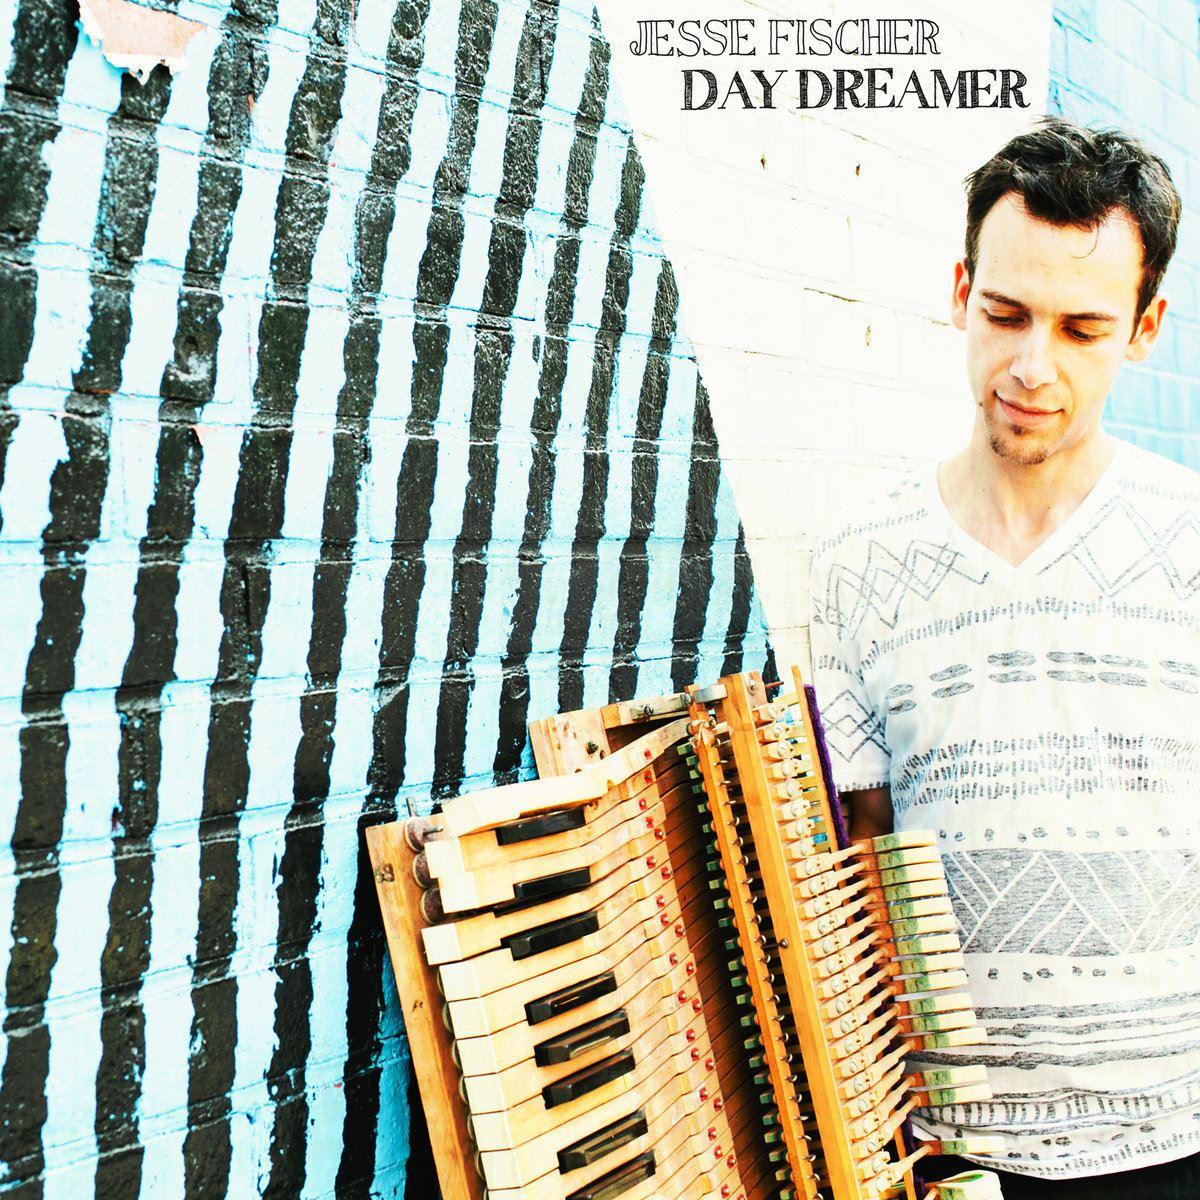 Jesse Fischer Day Dreamer Cover